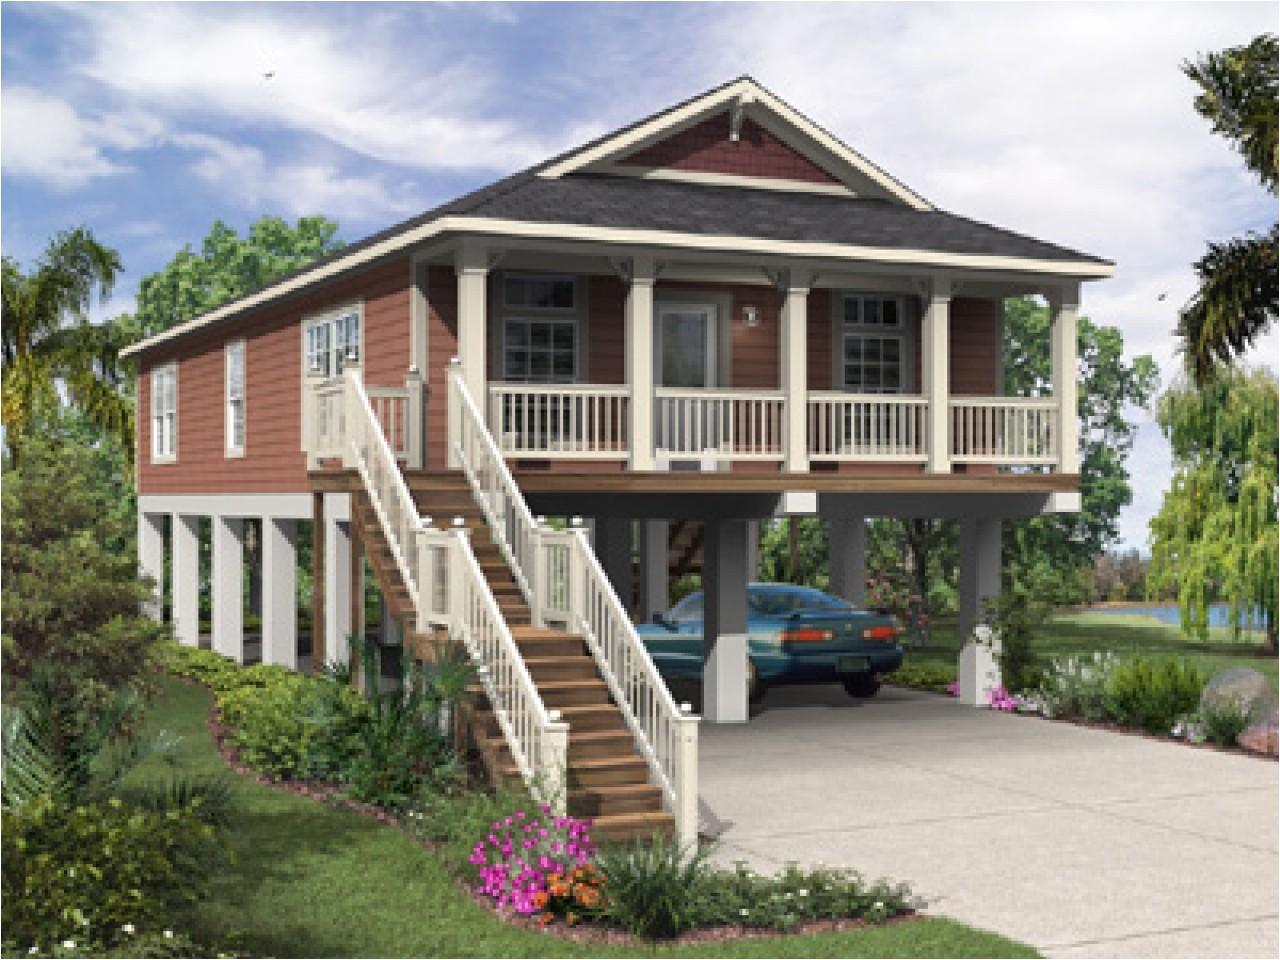 Elevated Coastal Home Plans Raised Beach House Plans with Elevator House Plans with